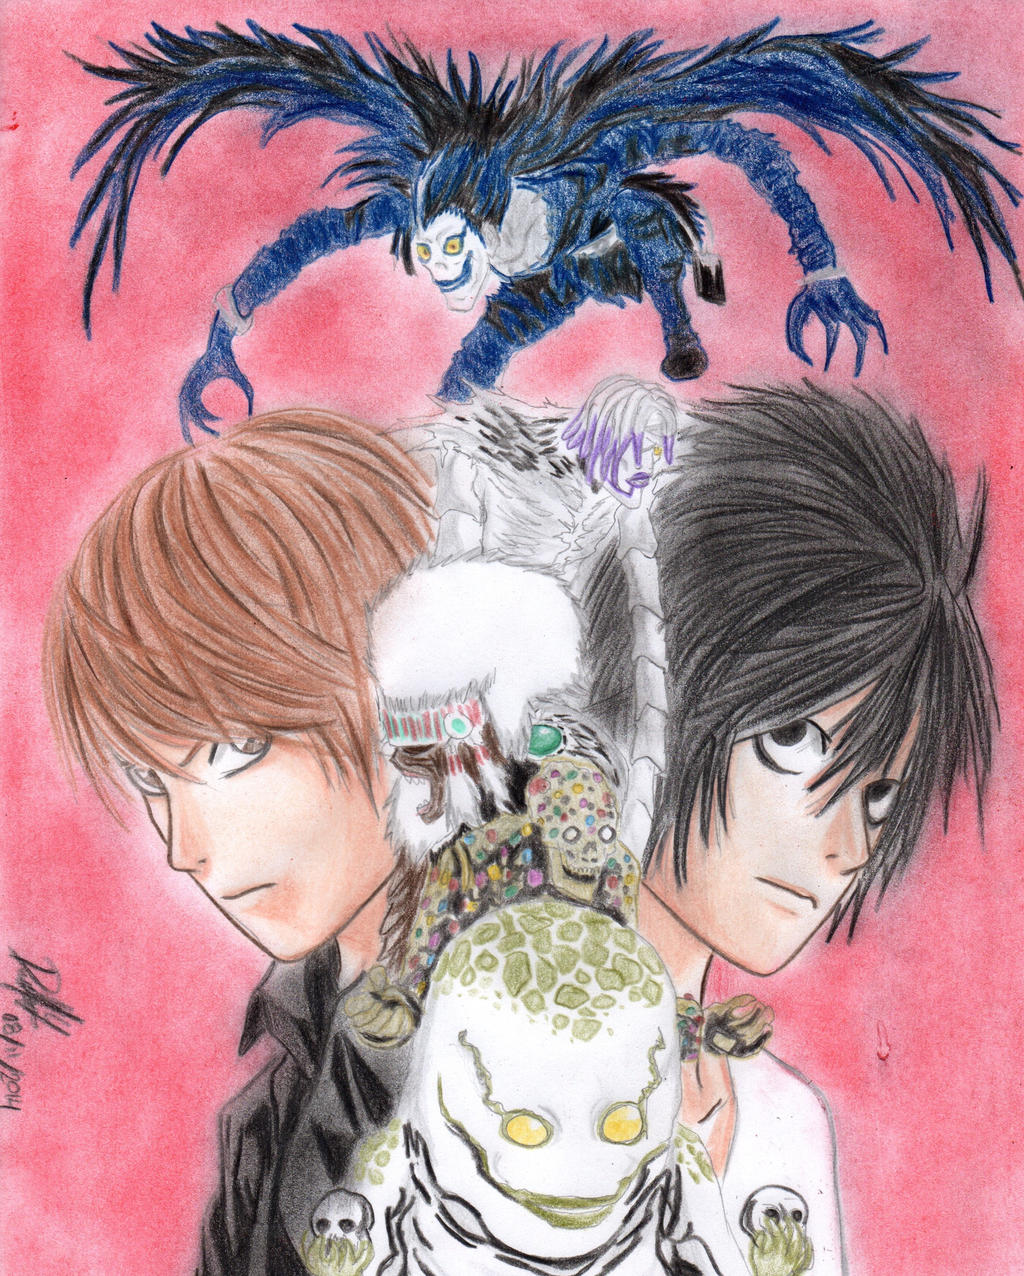 Kira and L by danielcamilo